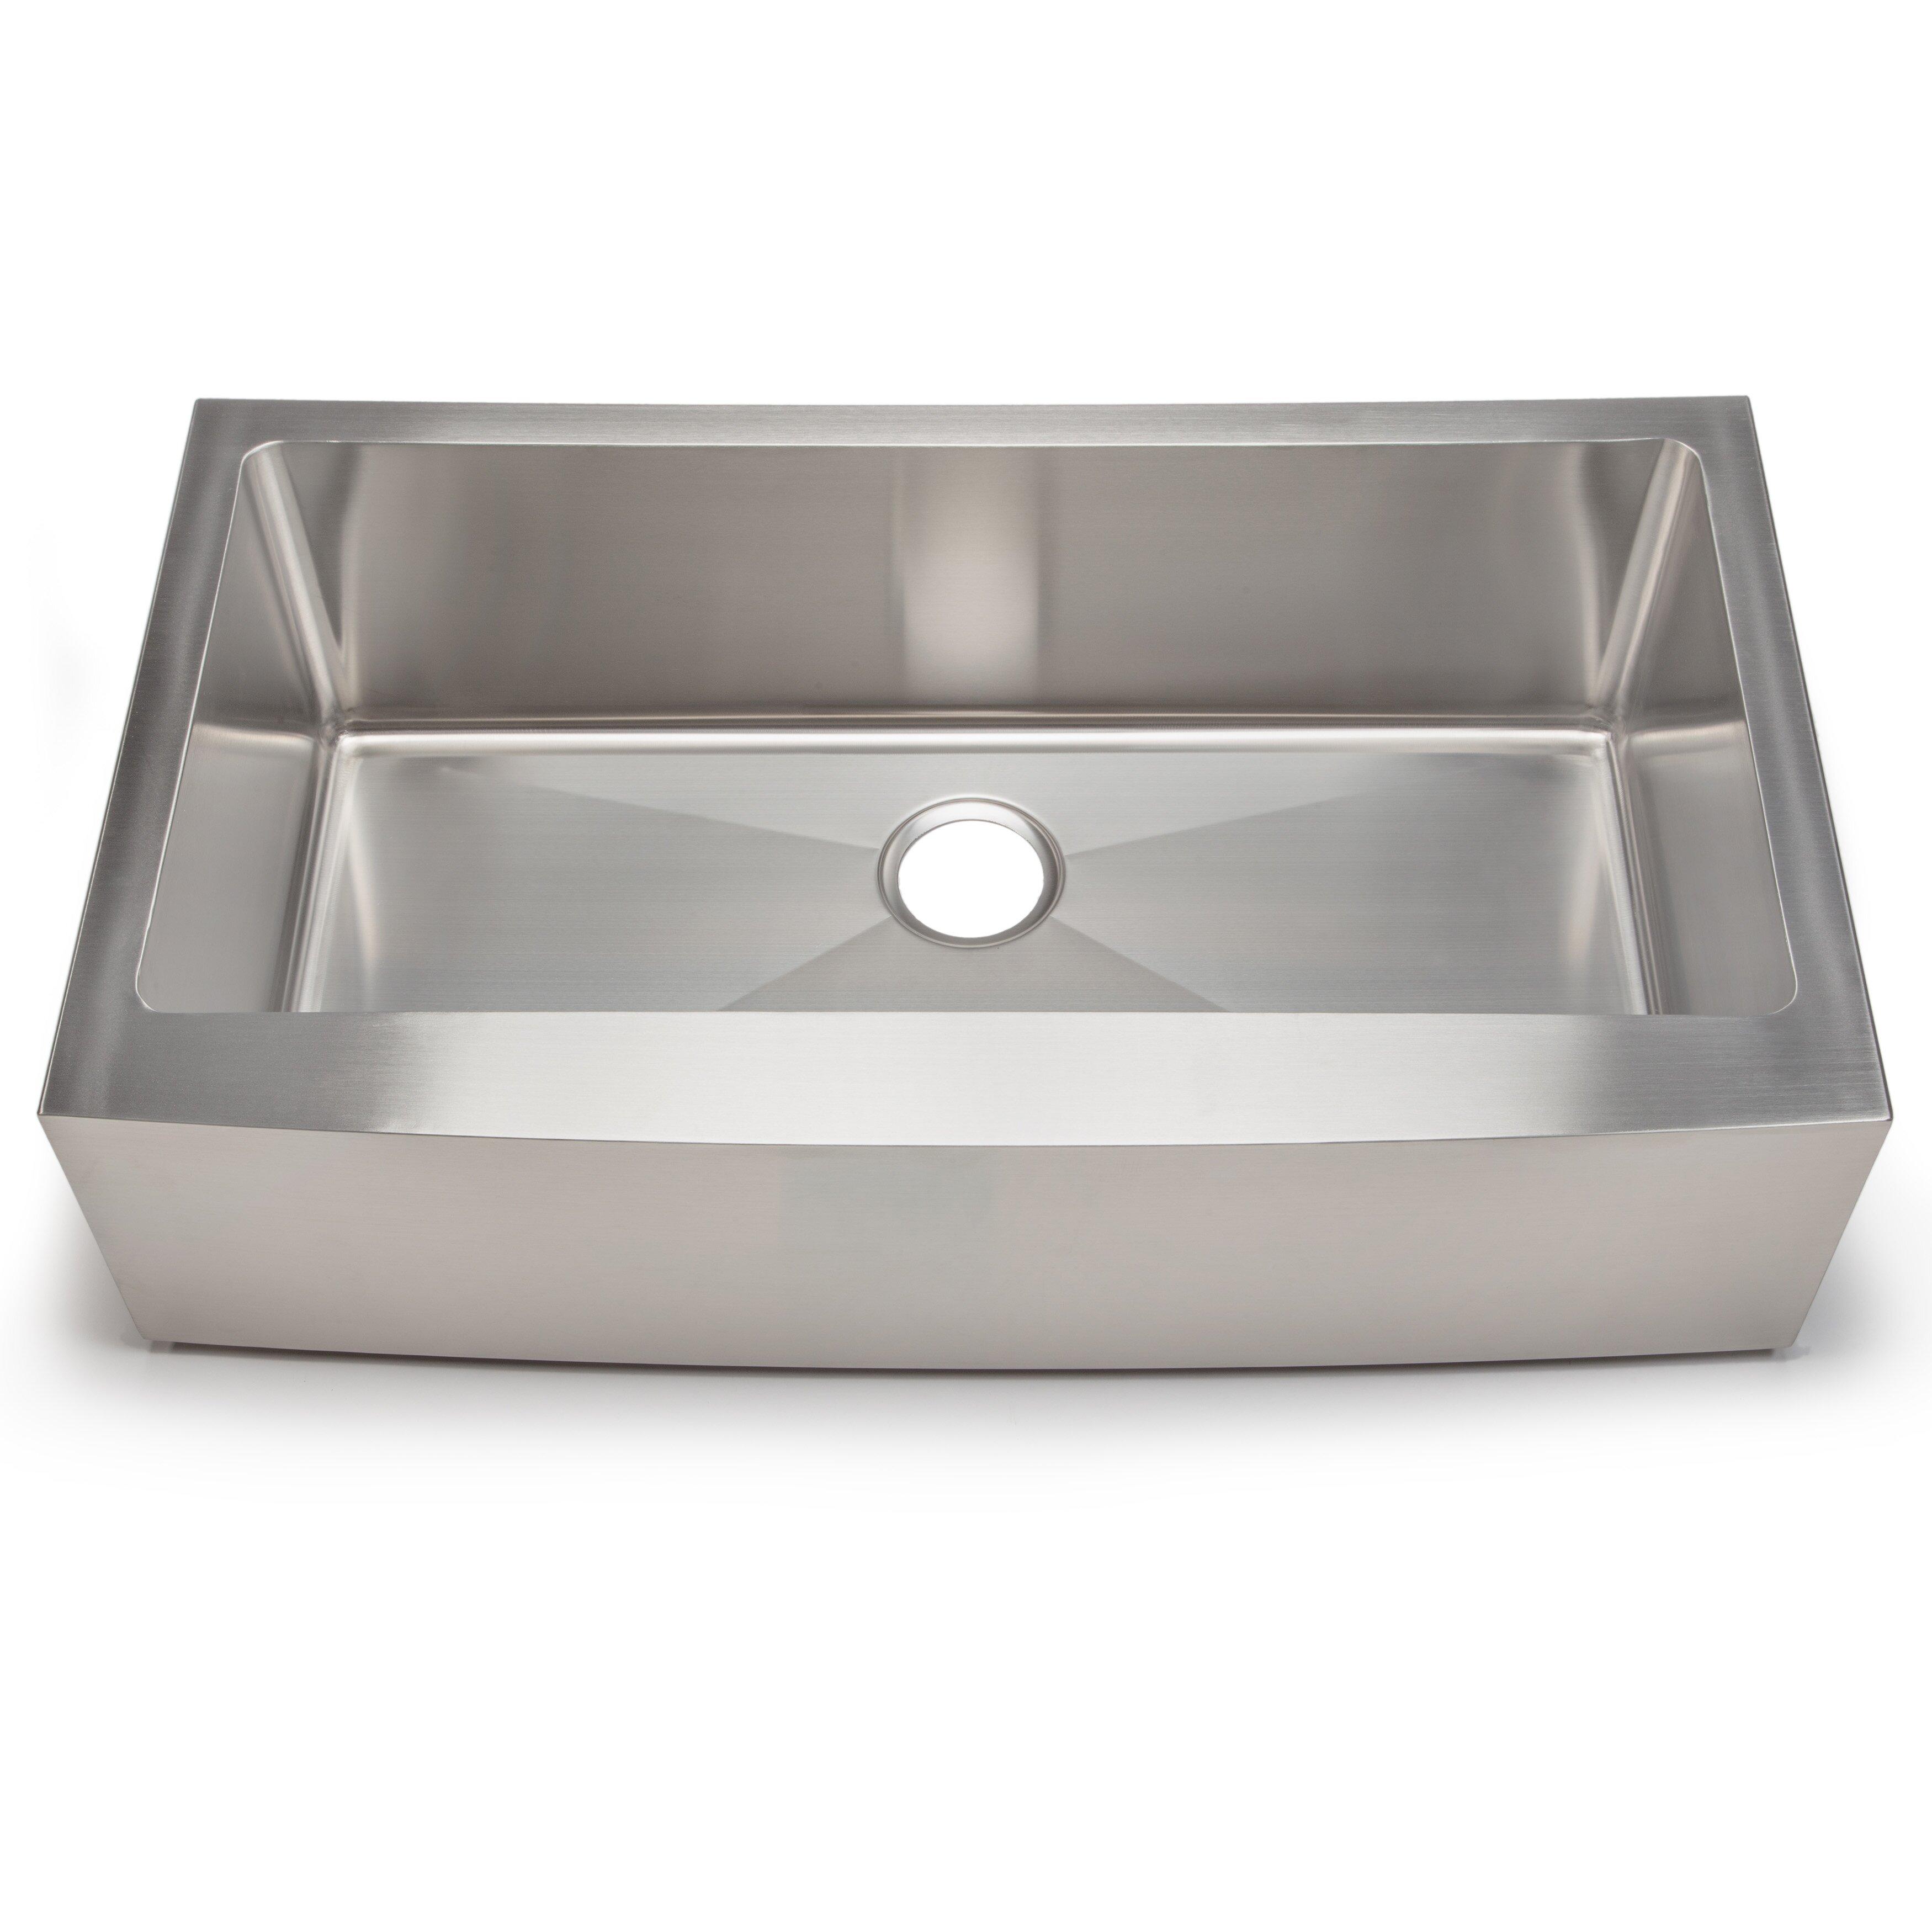 Single bowl vs double bowl kitchen sink - Hahn Chef Series 35 88 Quot X 20 75 Quot Single Bowl Farmhouse Kitchen Sink